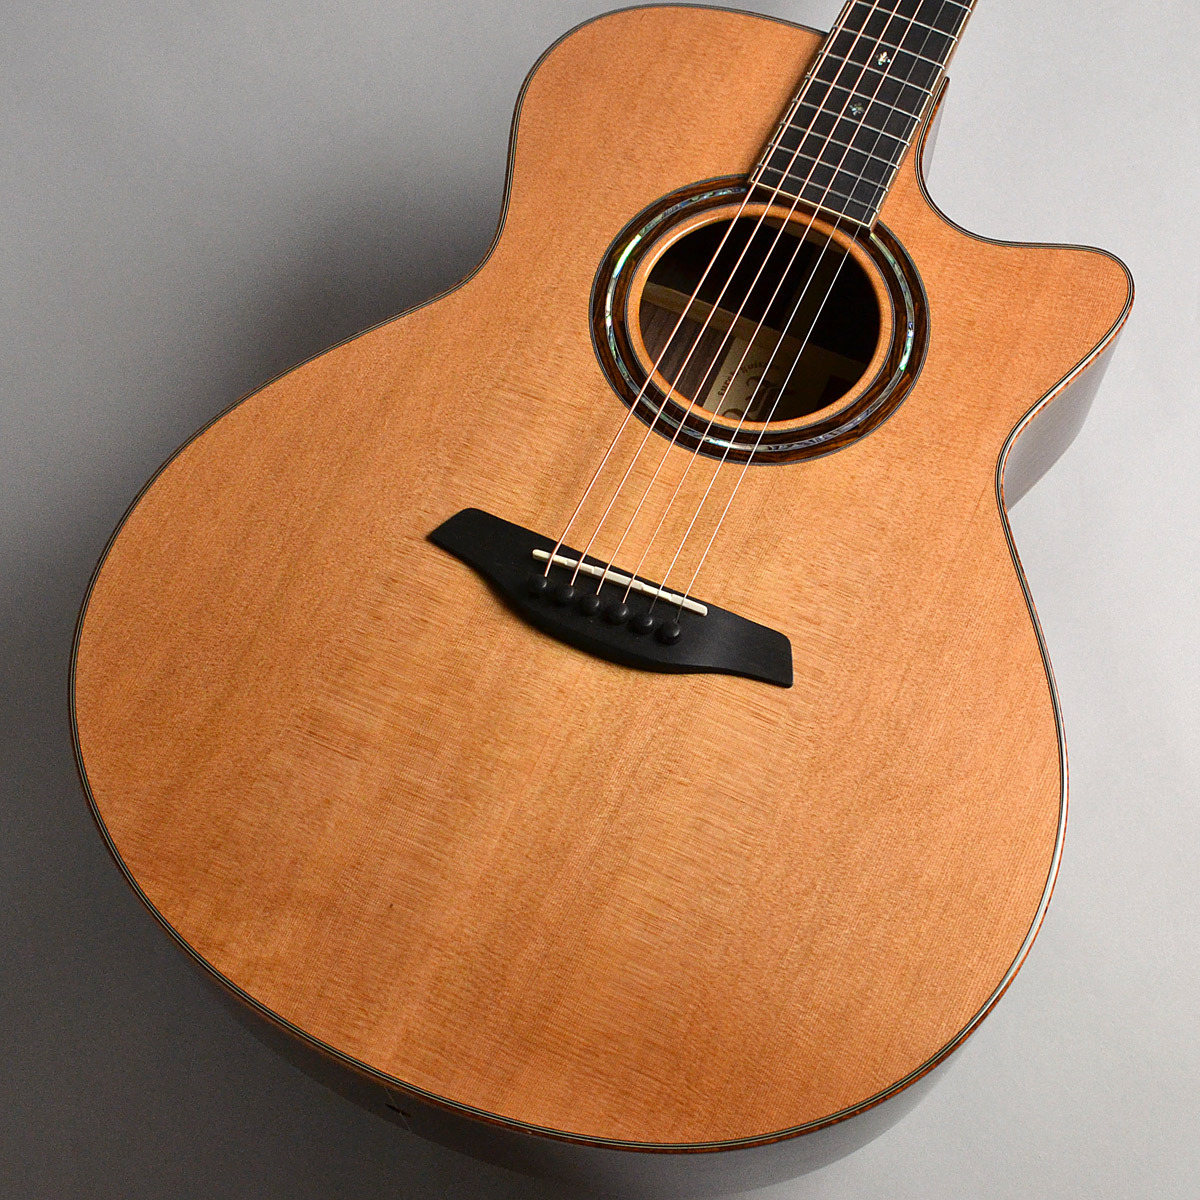 FURCH G27-CRCT Custom アコースティックギター 【フォルヒ 島村楽器コラボレーションモデル】【新宿PePe店】